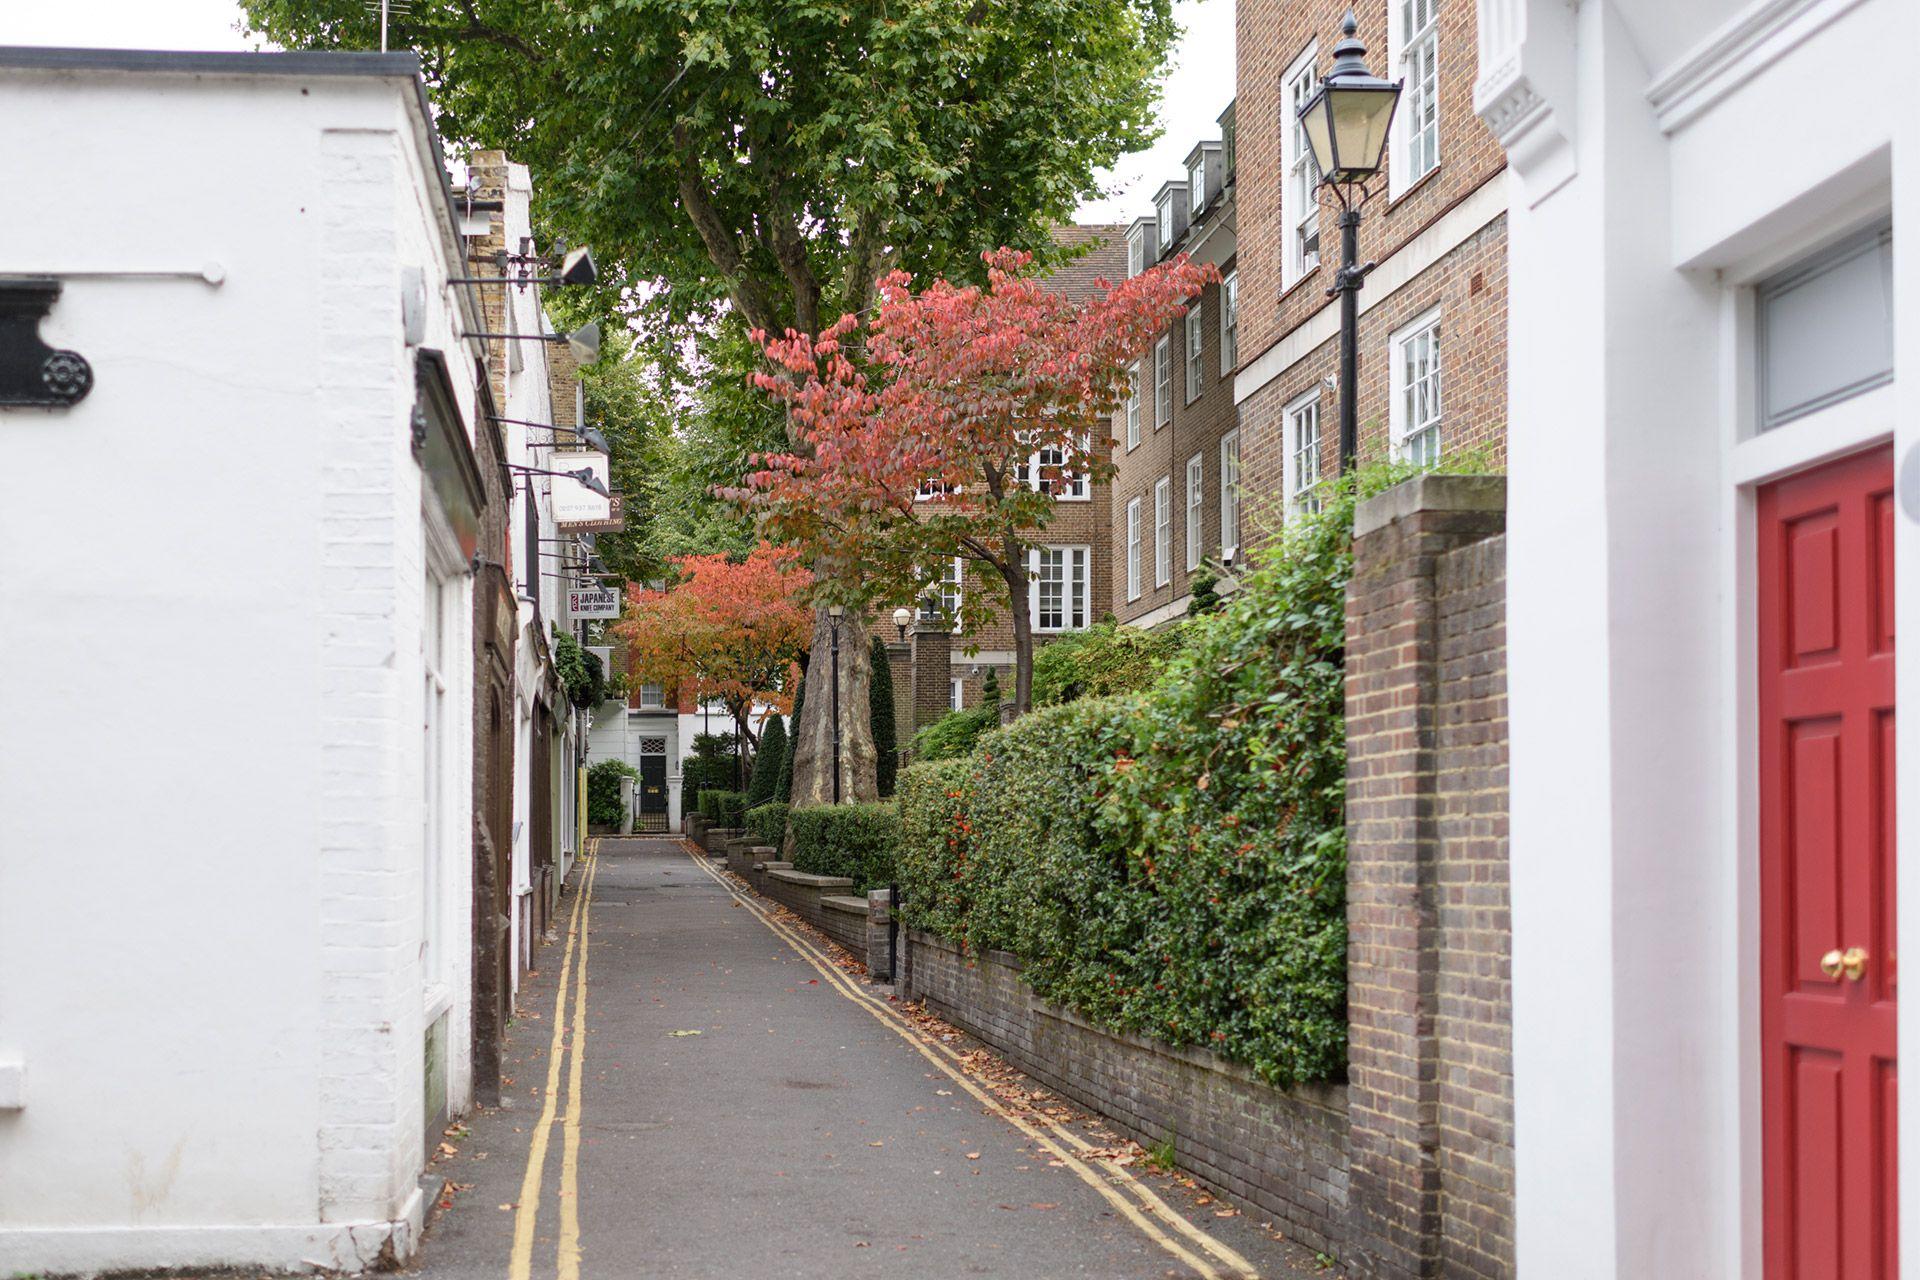 Charming London side street